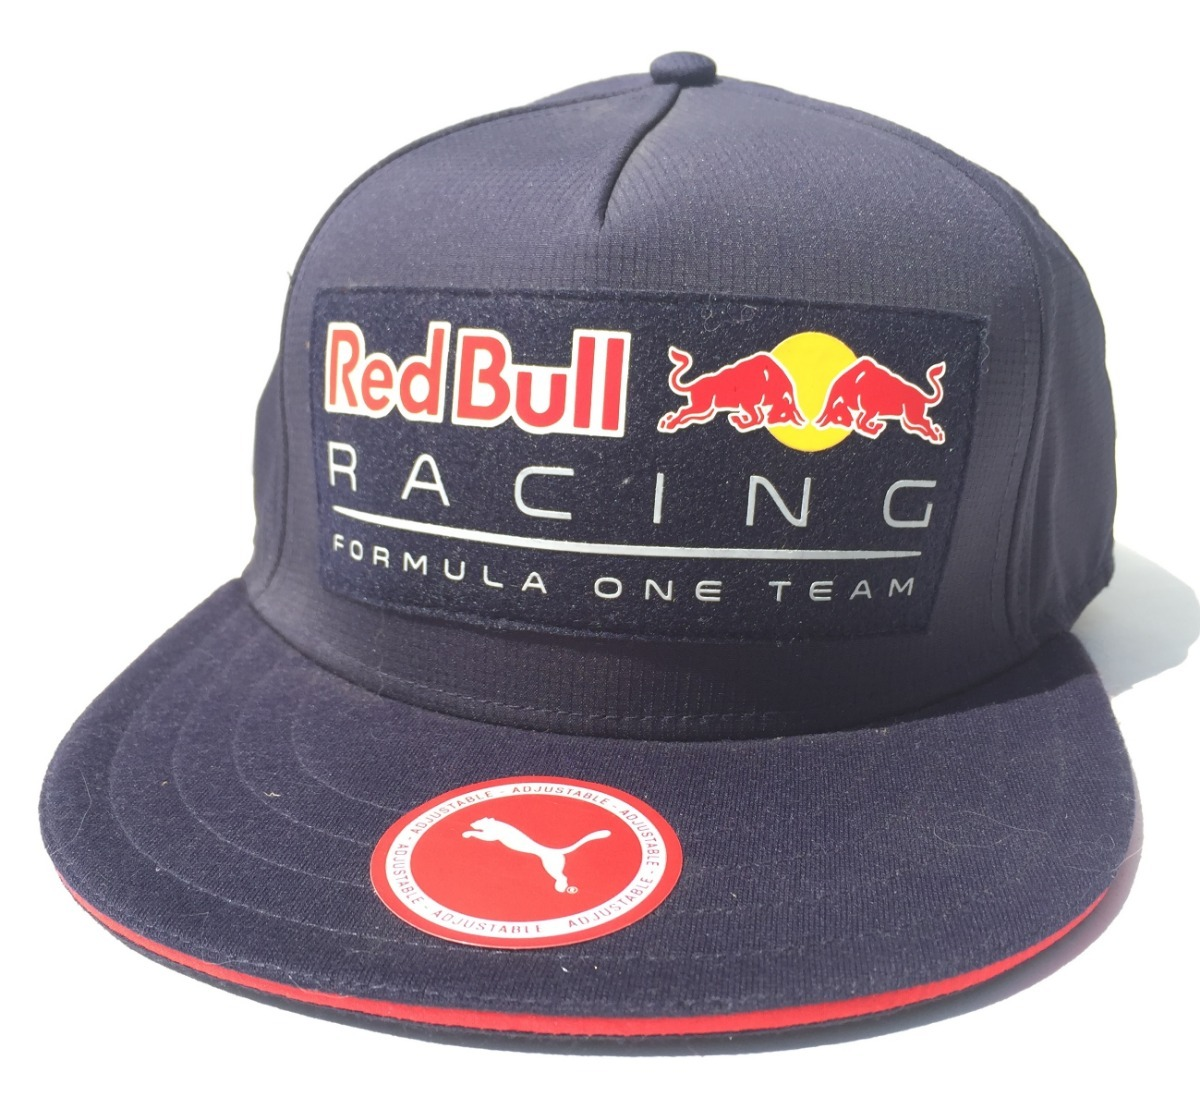 Gorra Puma Red Bull Racing Lifestyle Flatbrim U Adulto -   599.00 en ... 0837e4f4154